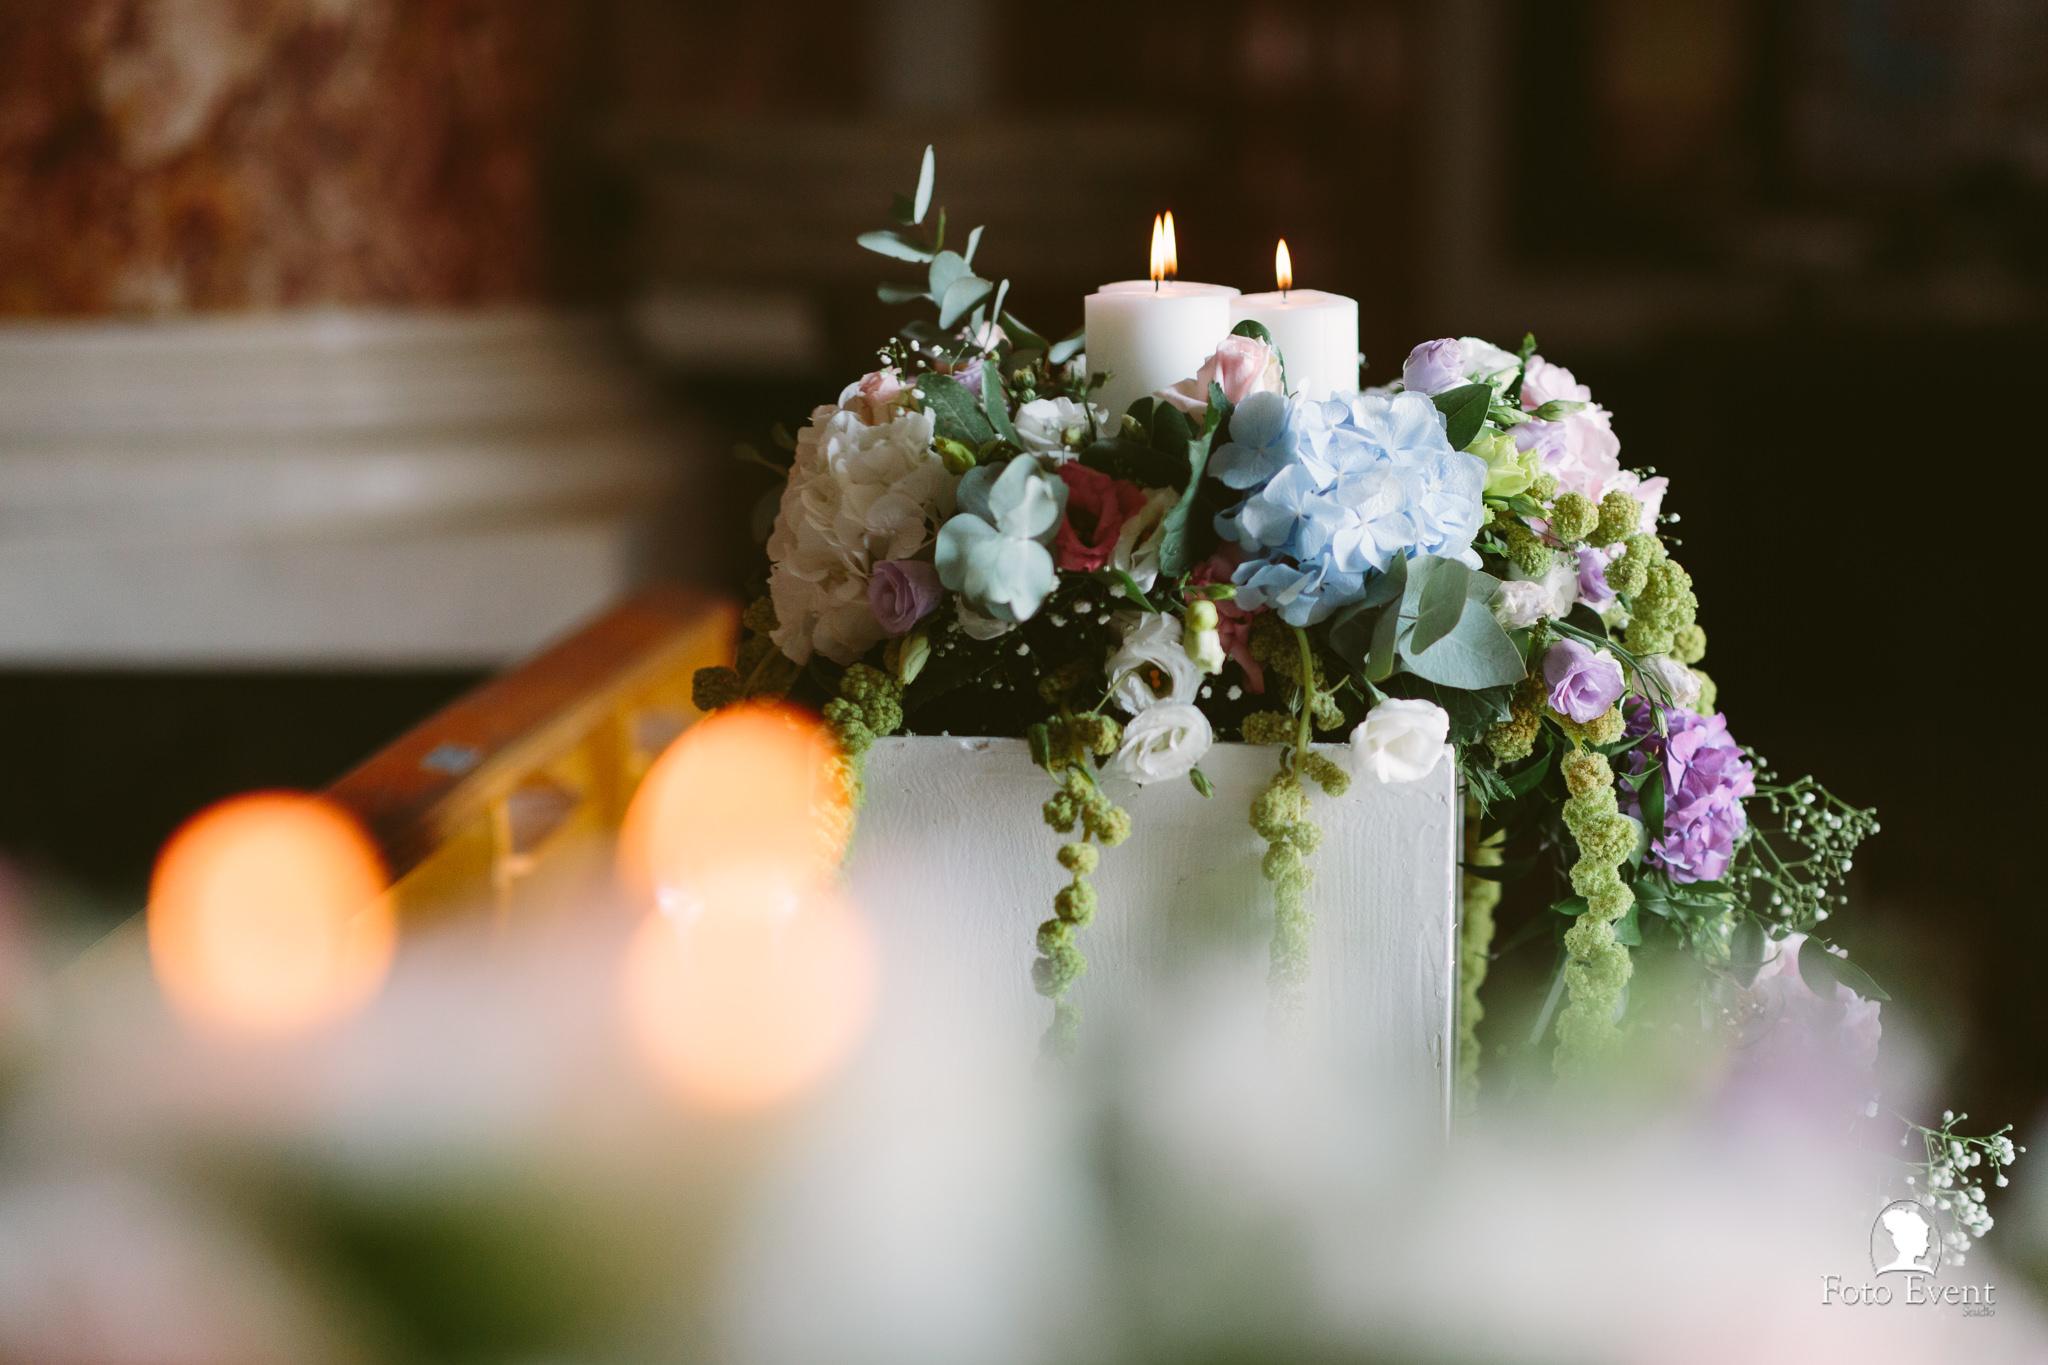 036-2019-08-22-Matrimonio-Angela-e-Nicola-Iaconis-Ric1-199